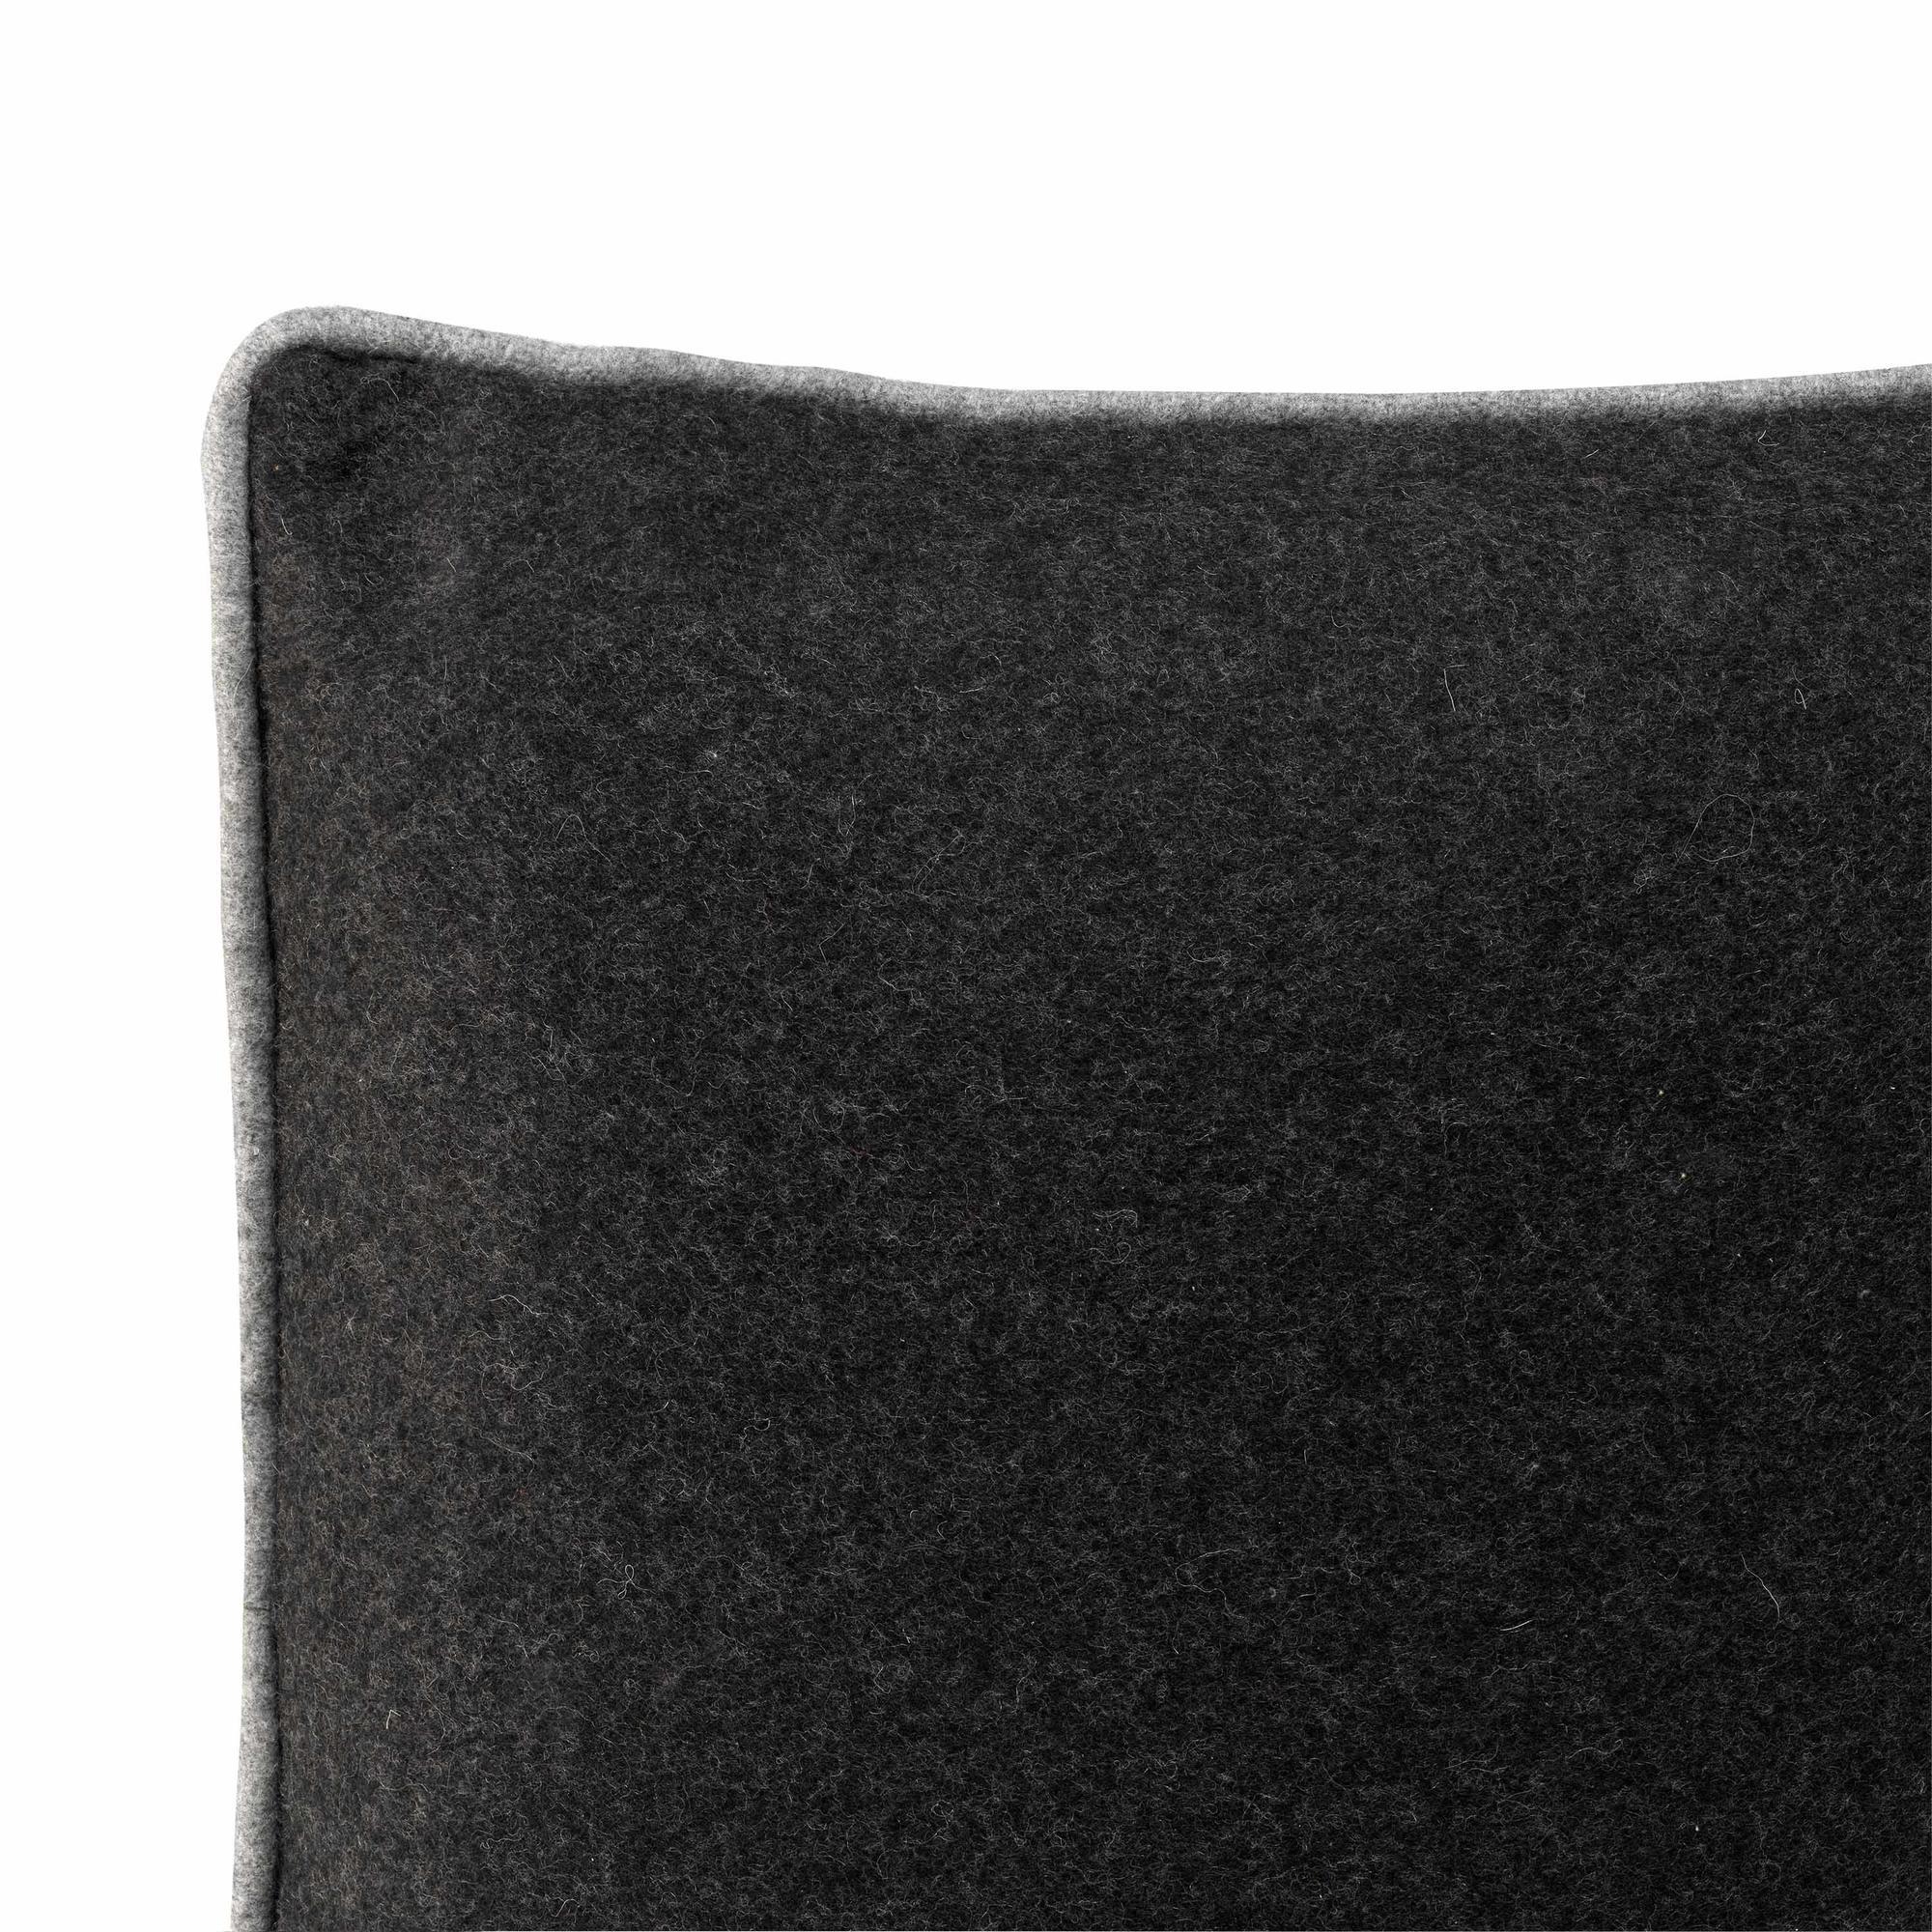 Cushion Cover 50 x 50 cm Piping Felt   Black